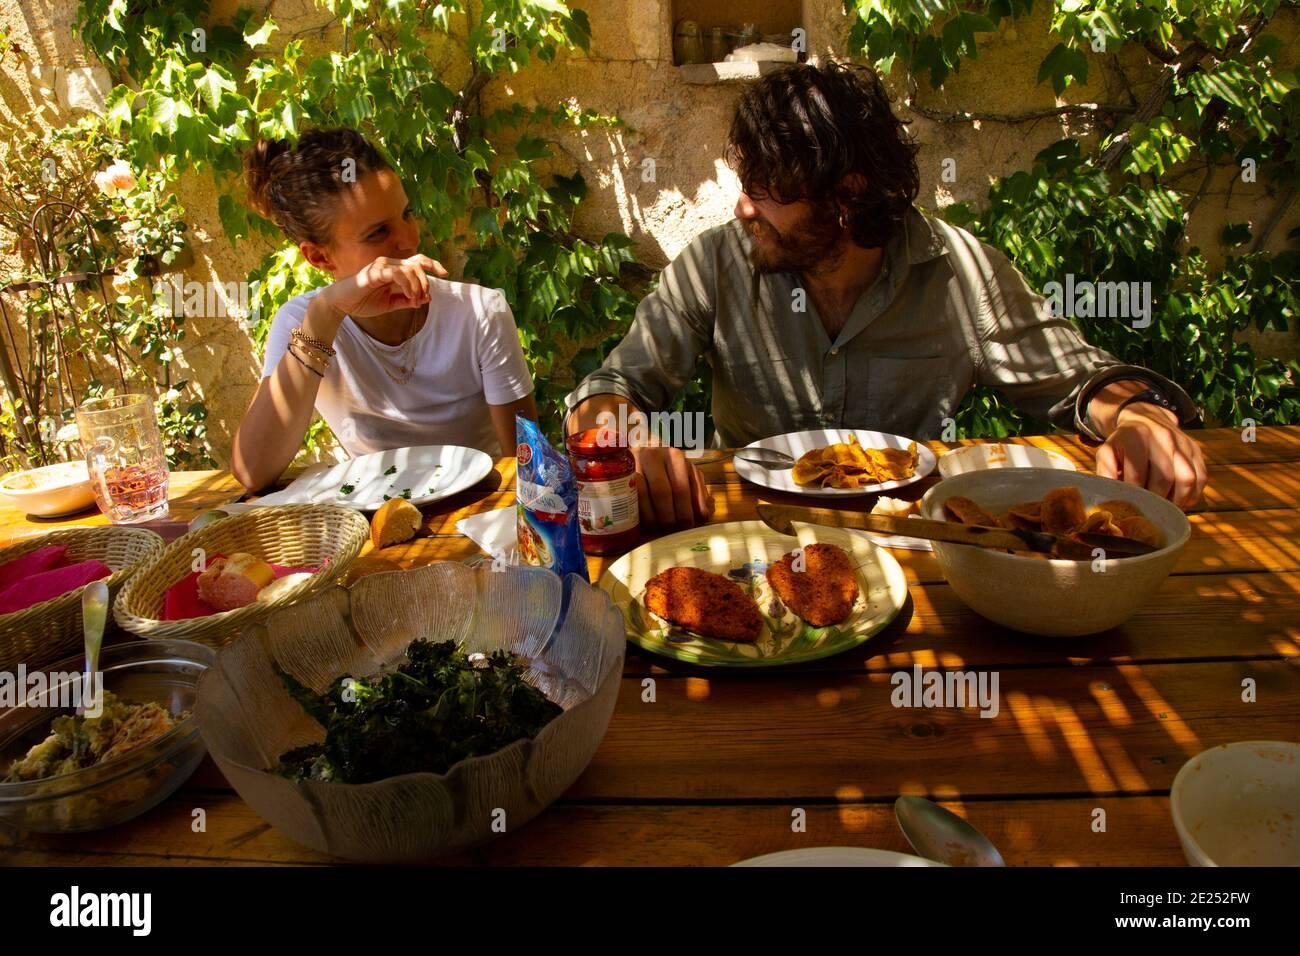 Una joven pareja disfrutando de una comida mediterránea. Foto de stock